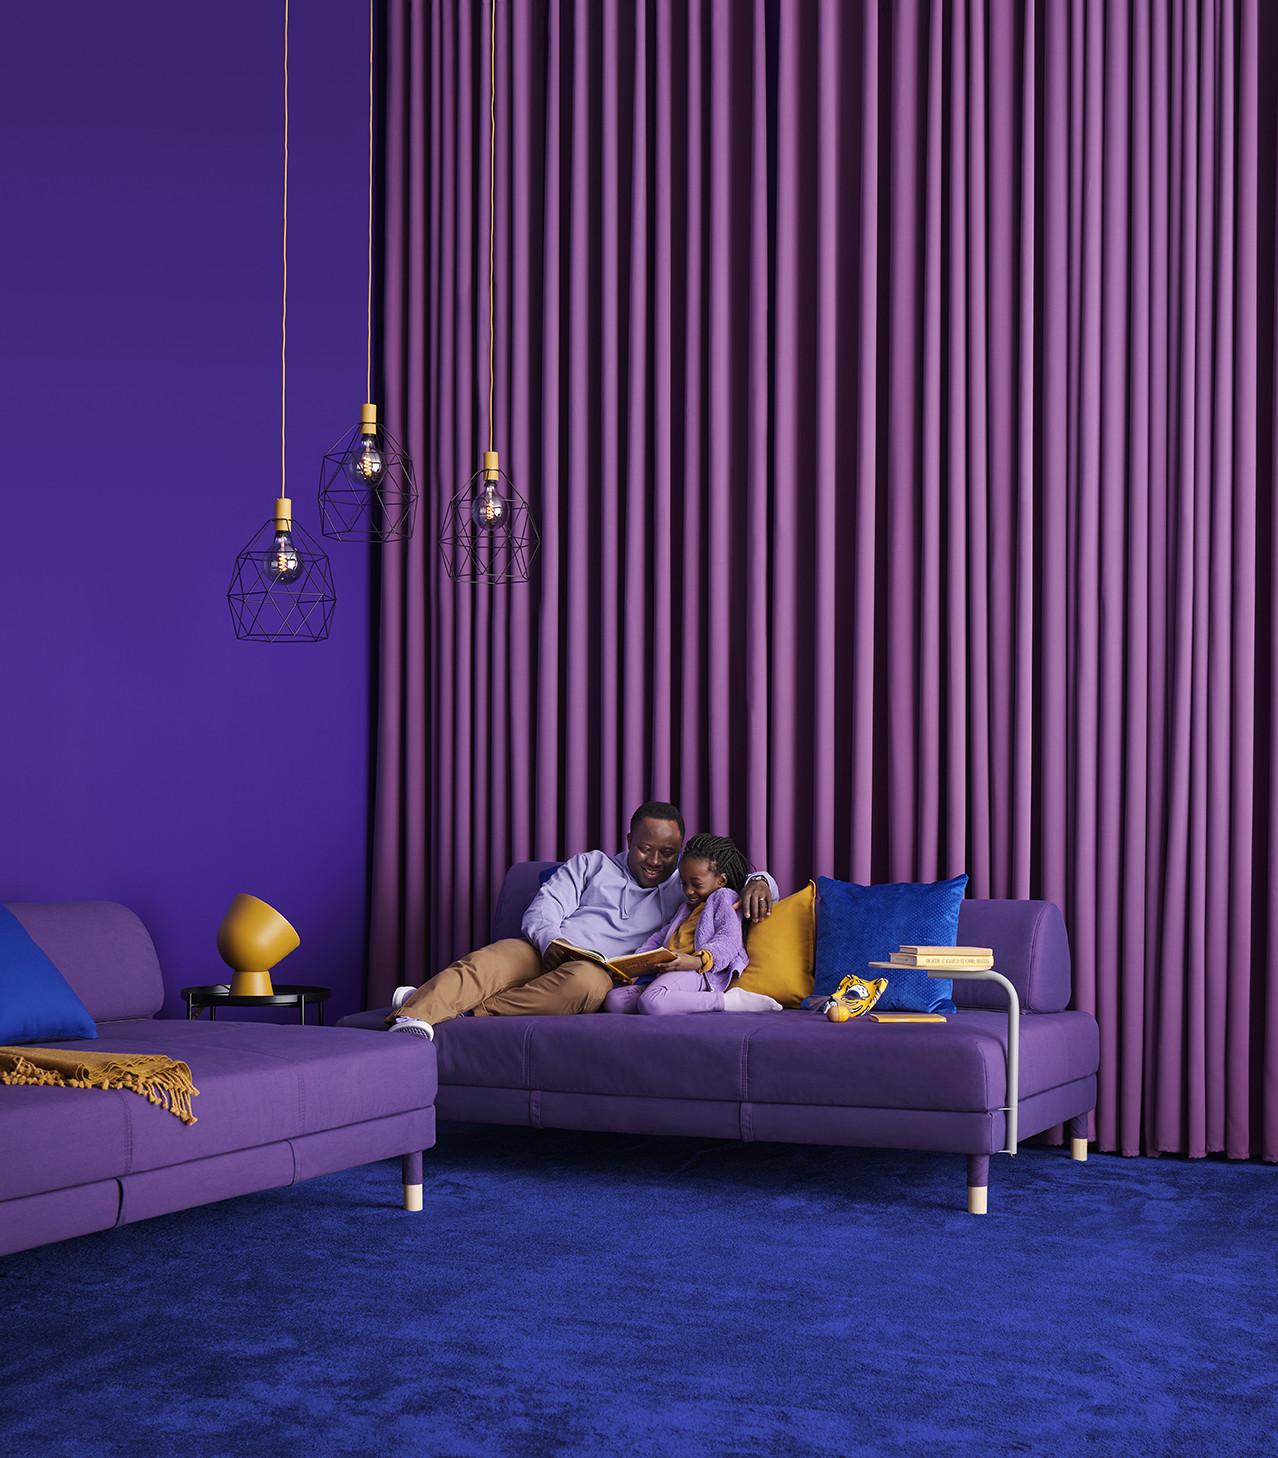 novedad catálogo ikea 2020 salón sofá cama con mesa auxiliar púrpura